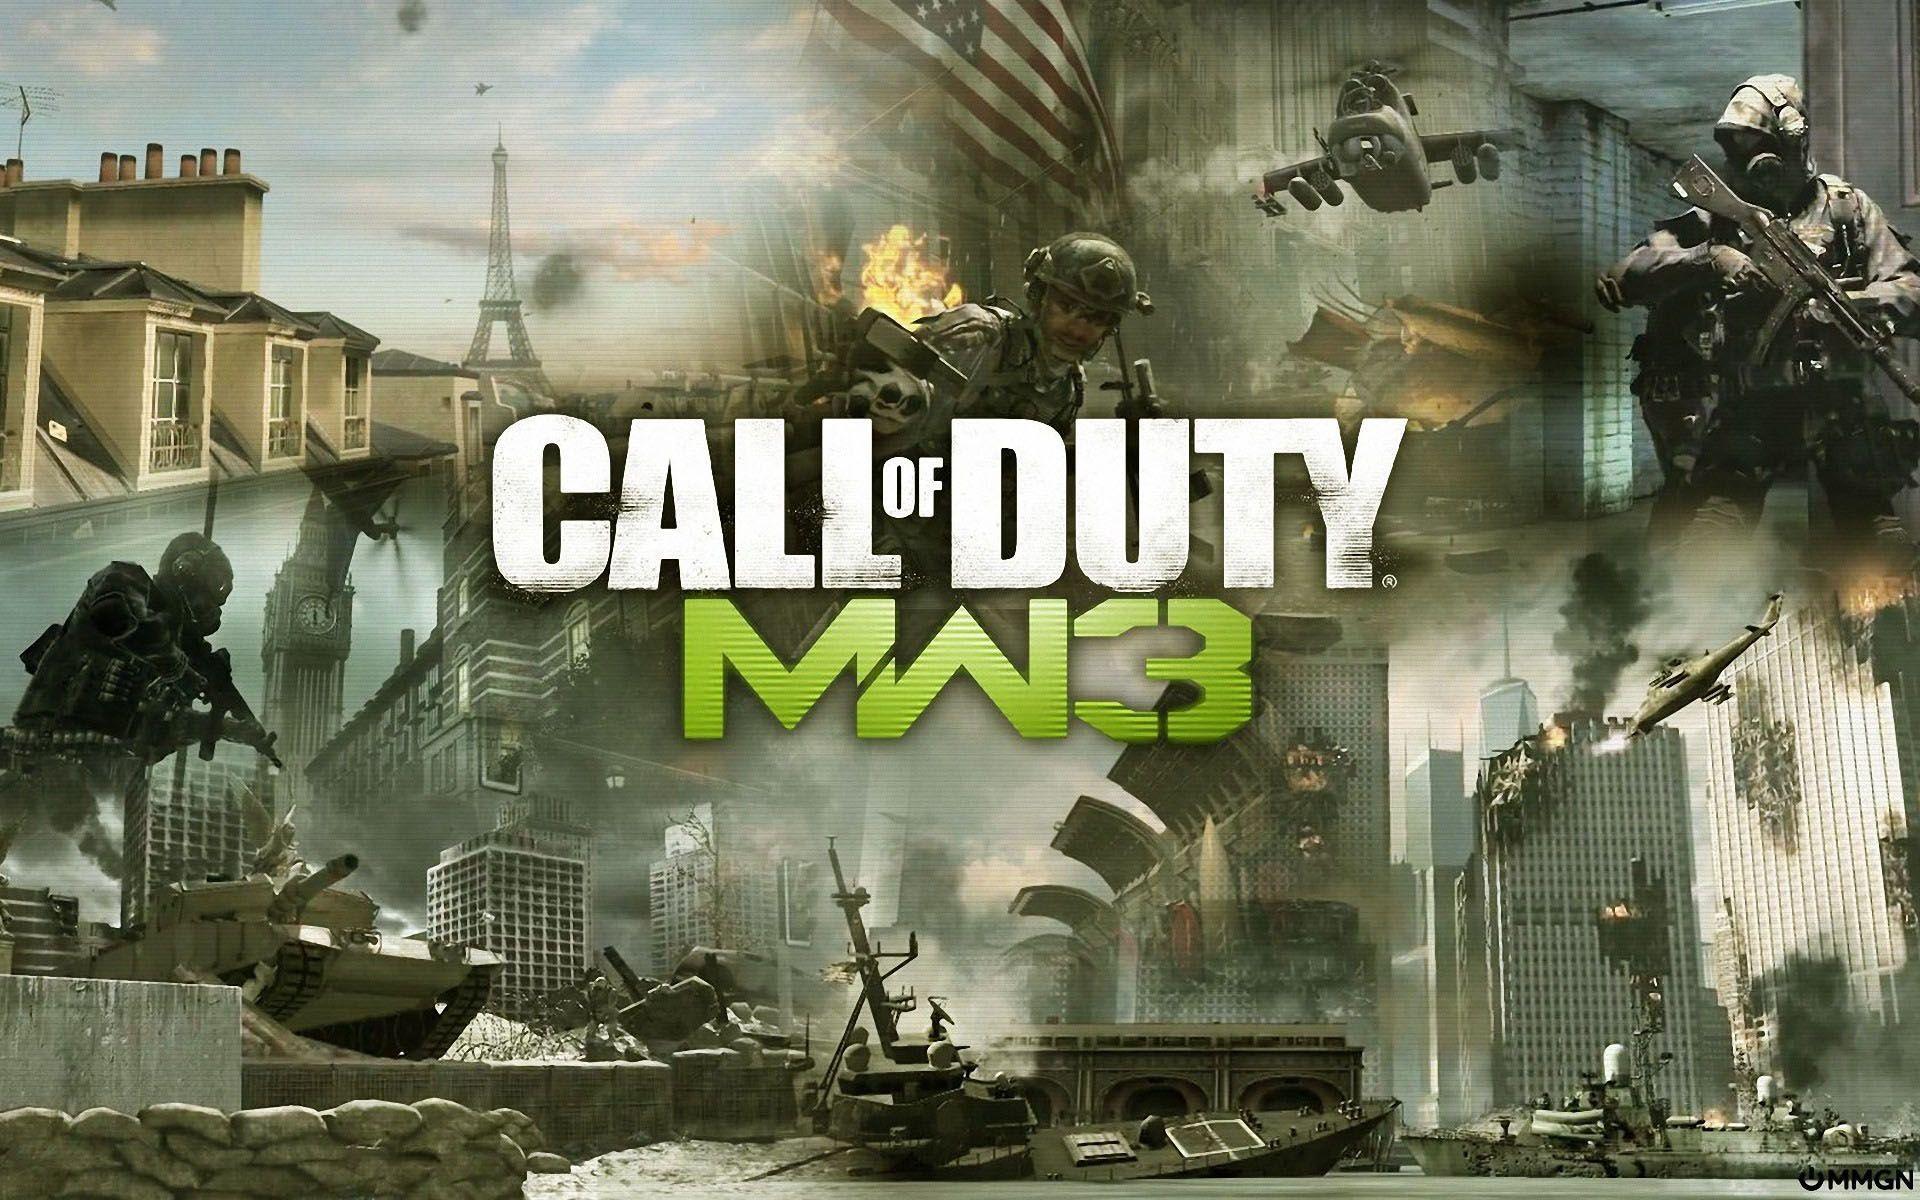 Call Of Duty Mwf 3 Wallpaper Call Of Duty Modern Warfare 3